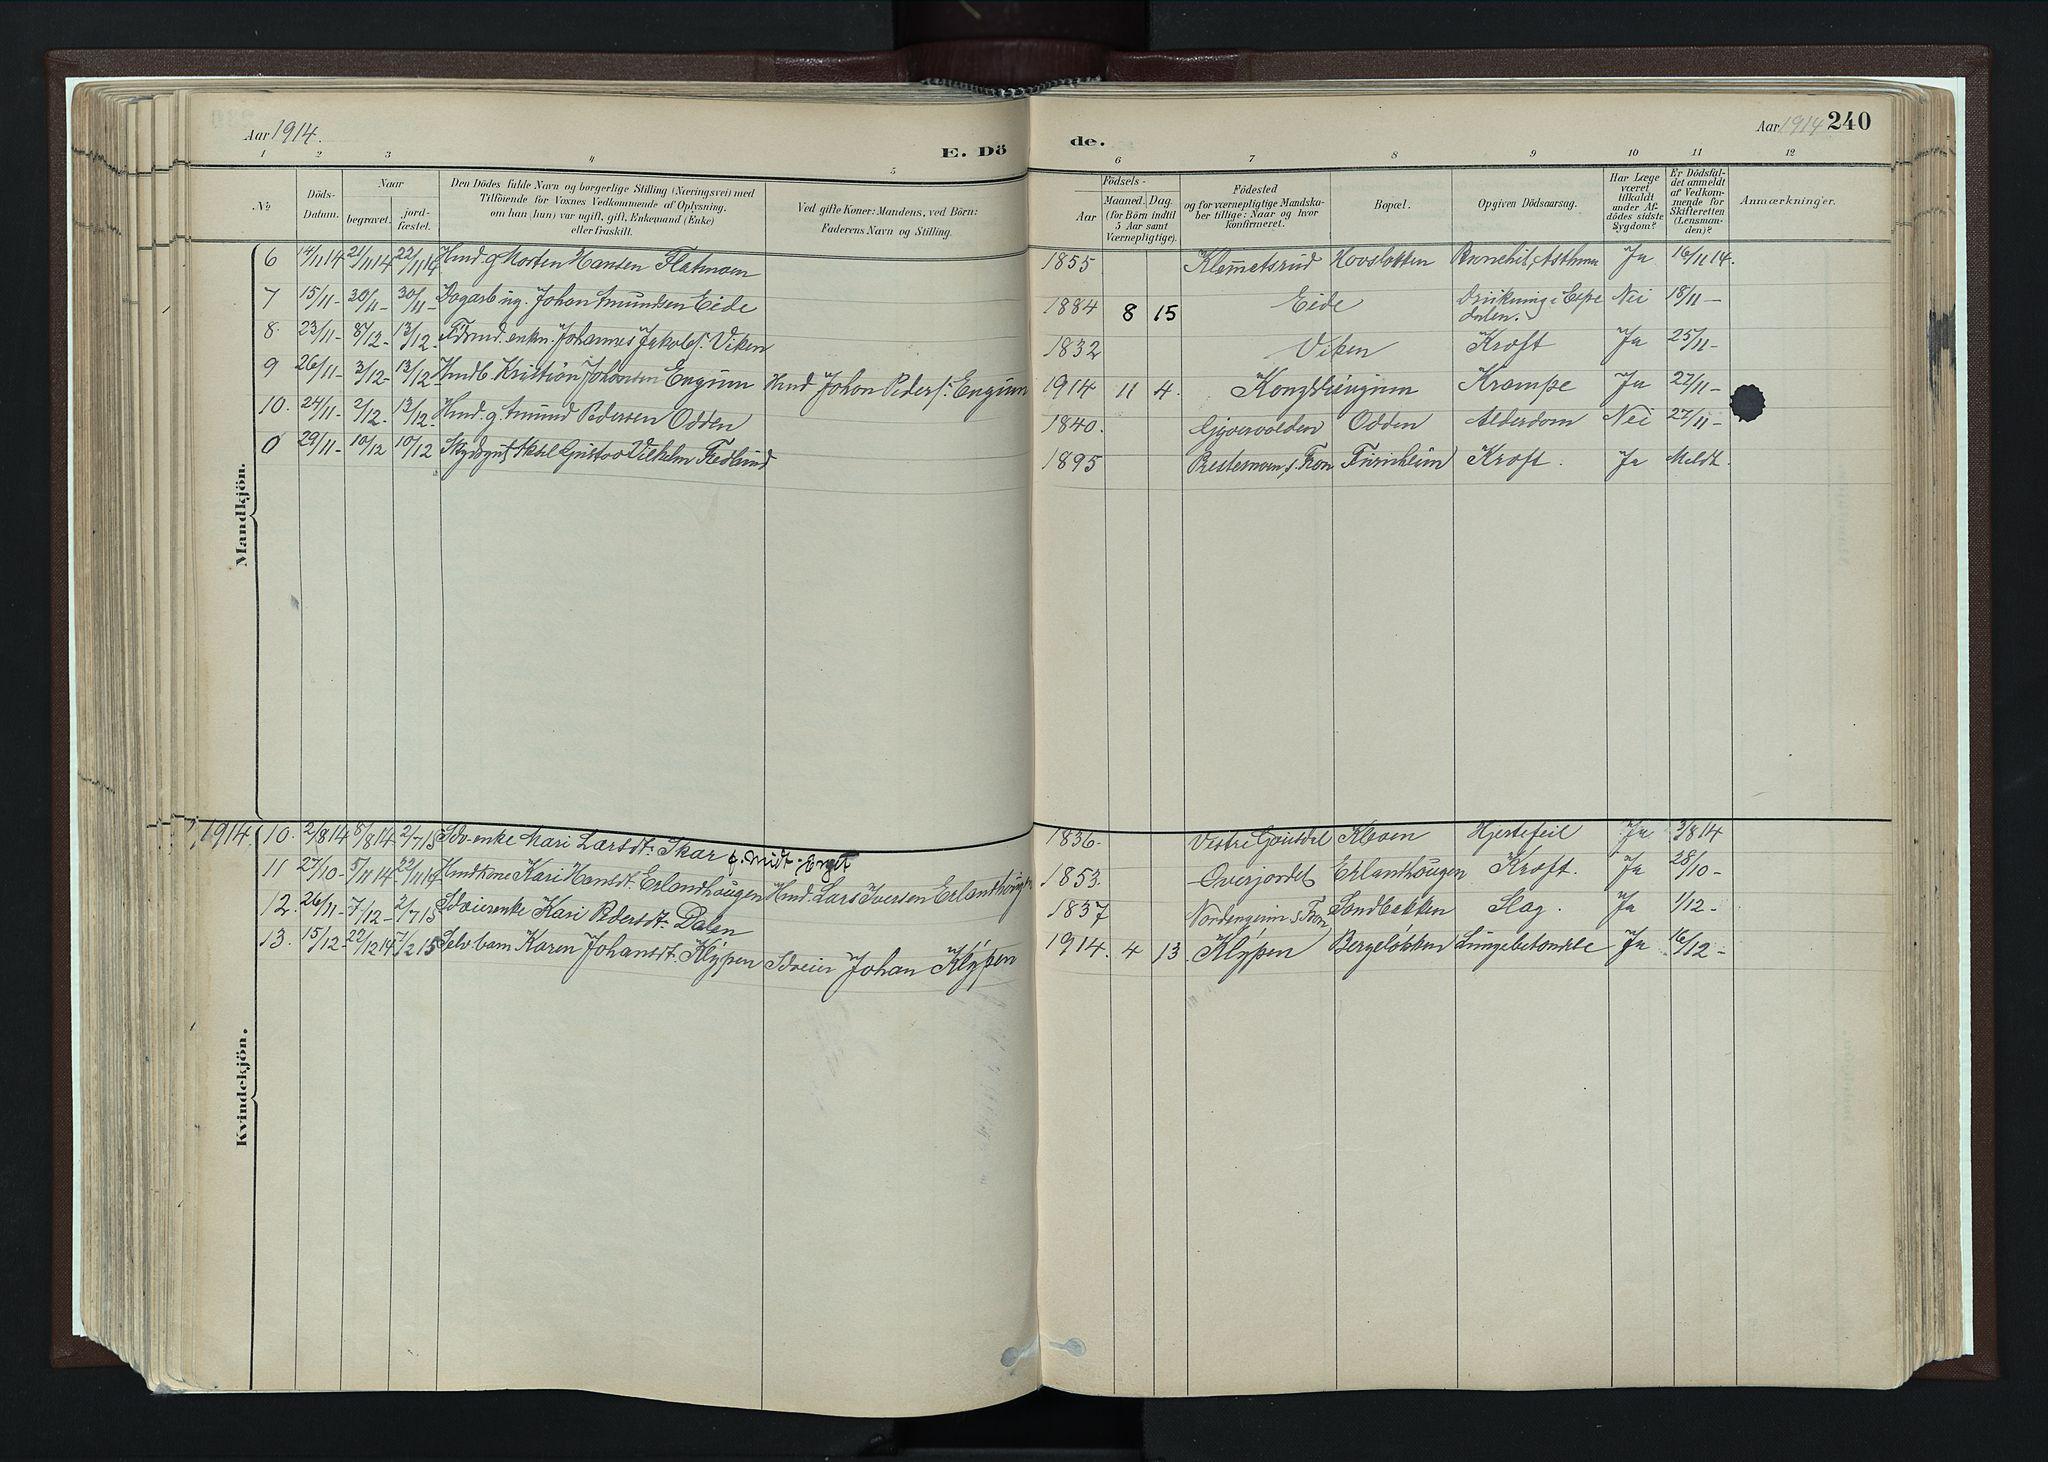 SAH, Nord-Fron prestekontor, Ministerialbok nr. 4, 1884-1914, s. 240